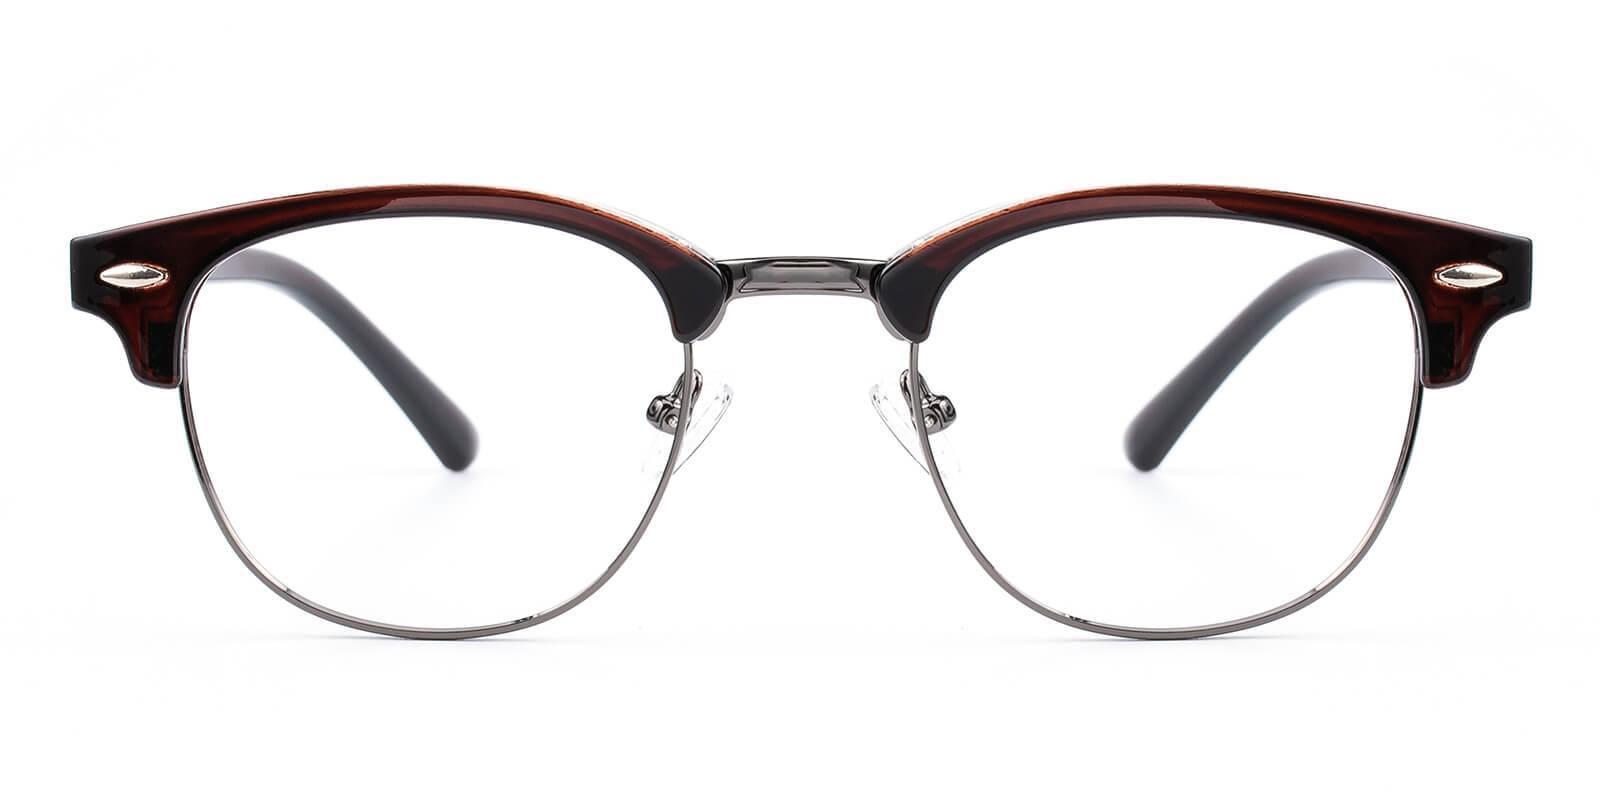 Creative-Brown-Browline-Metal / Combination / Plastic-Eyeglasses-detail